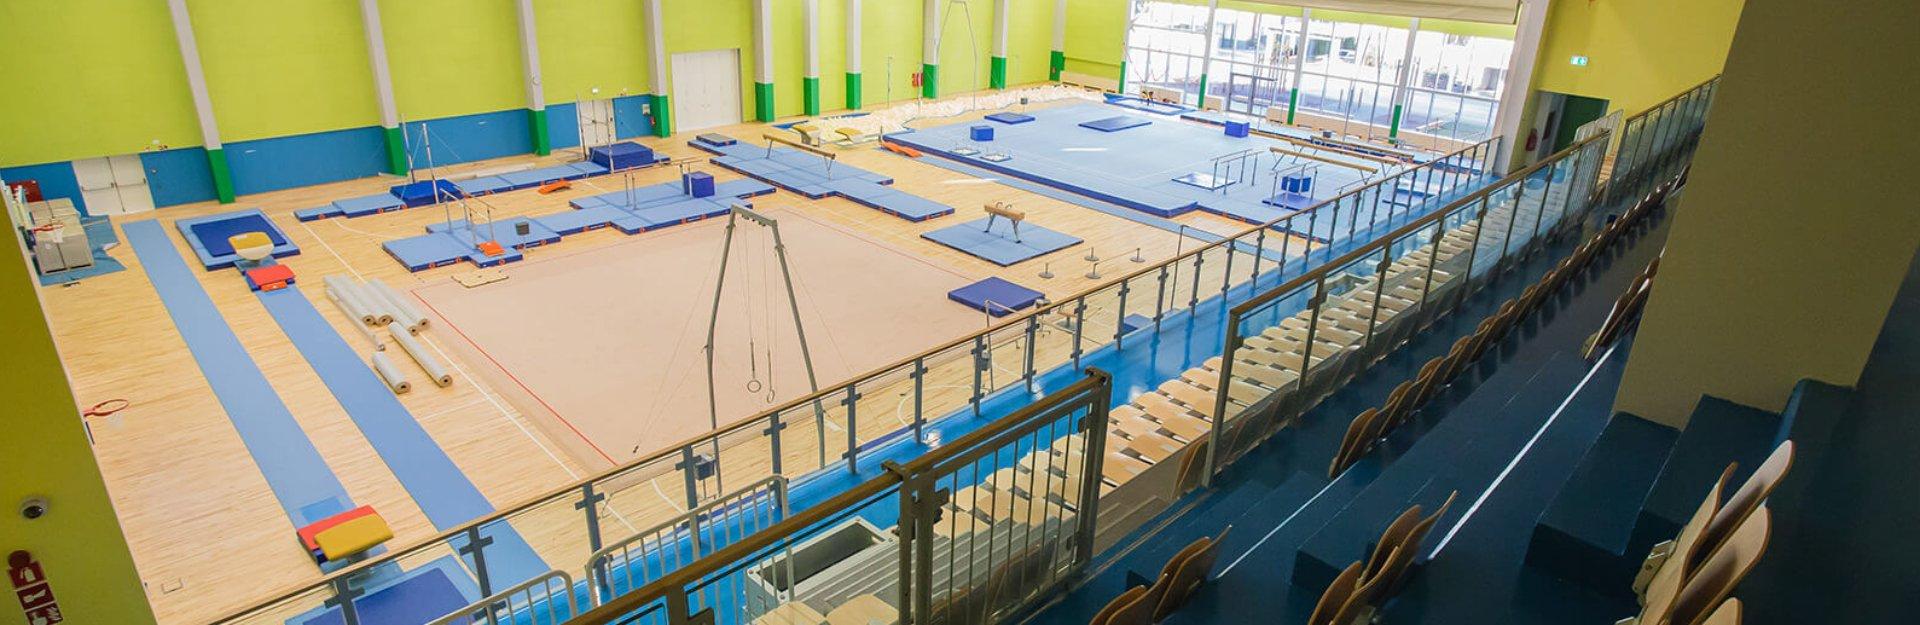 Gimnastični center Ljubljana